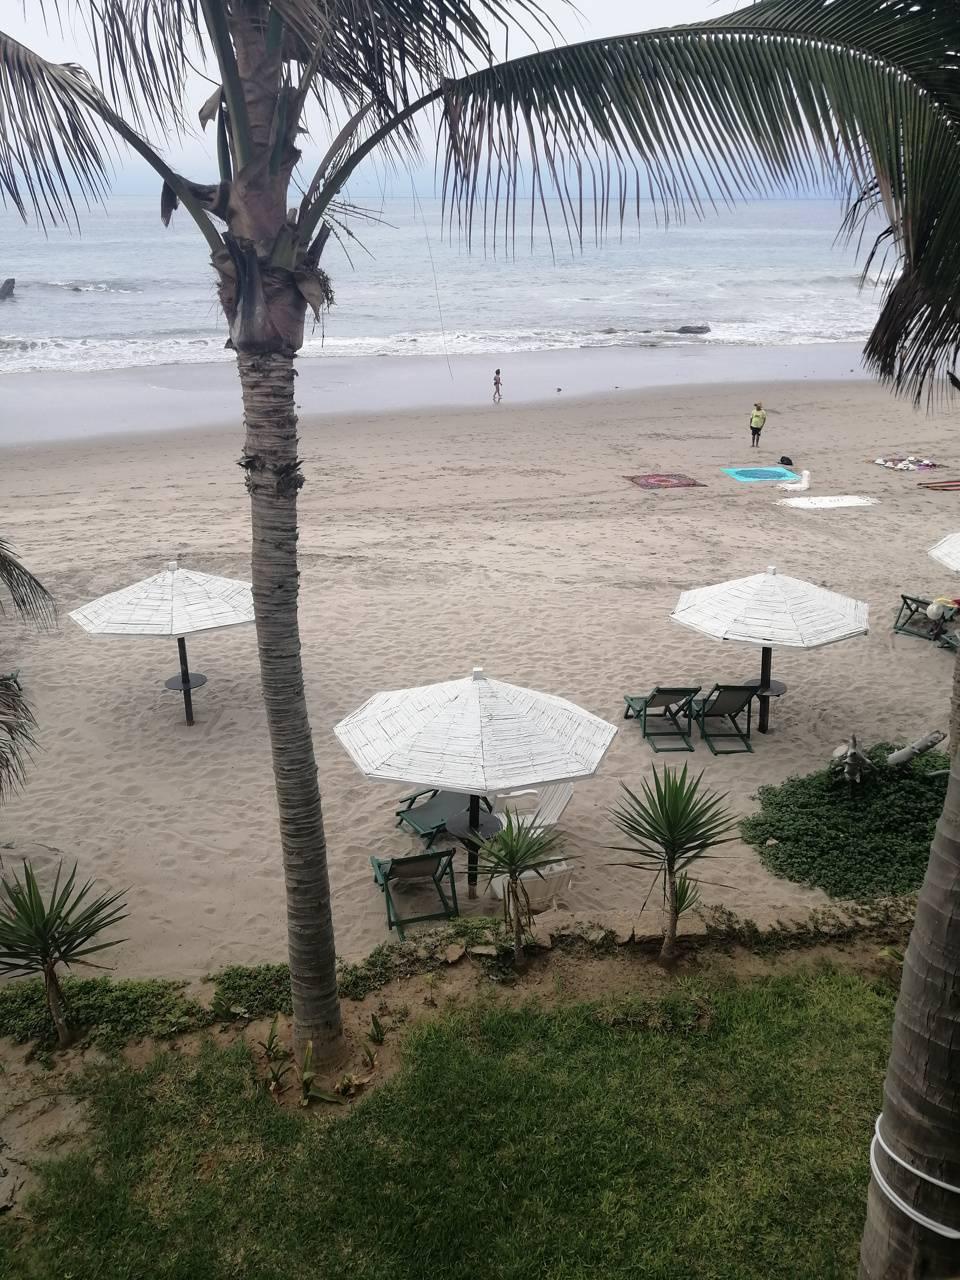 Playa lujosa